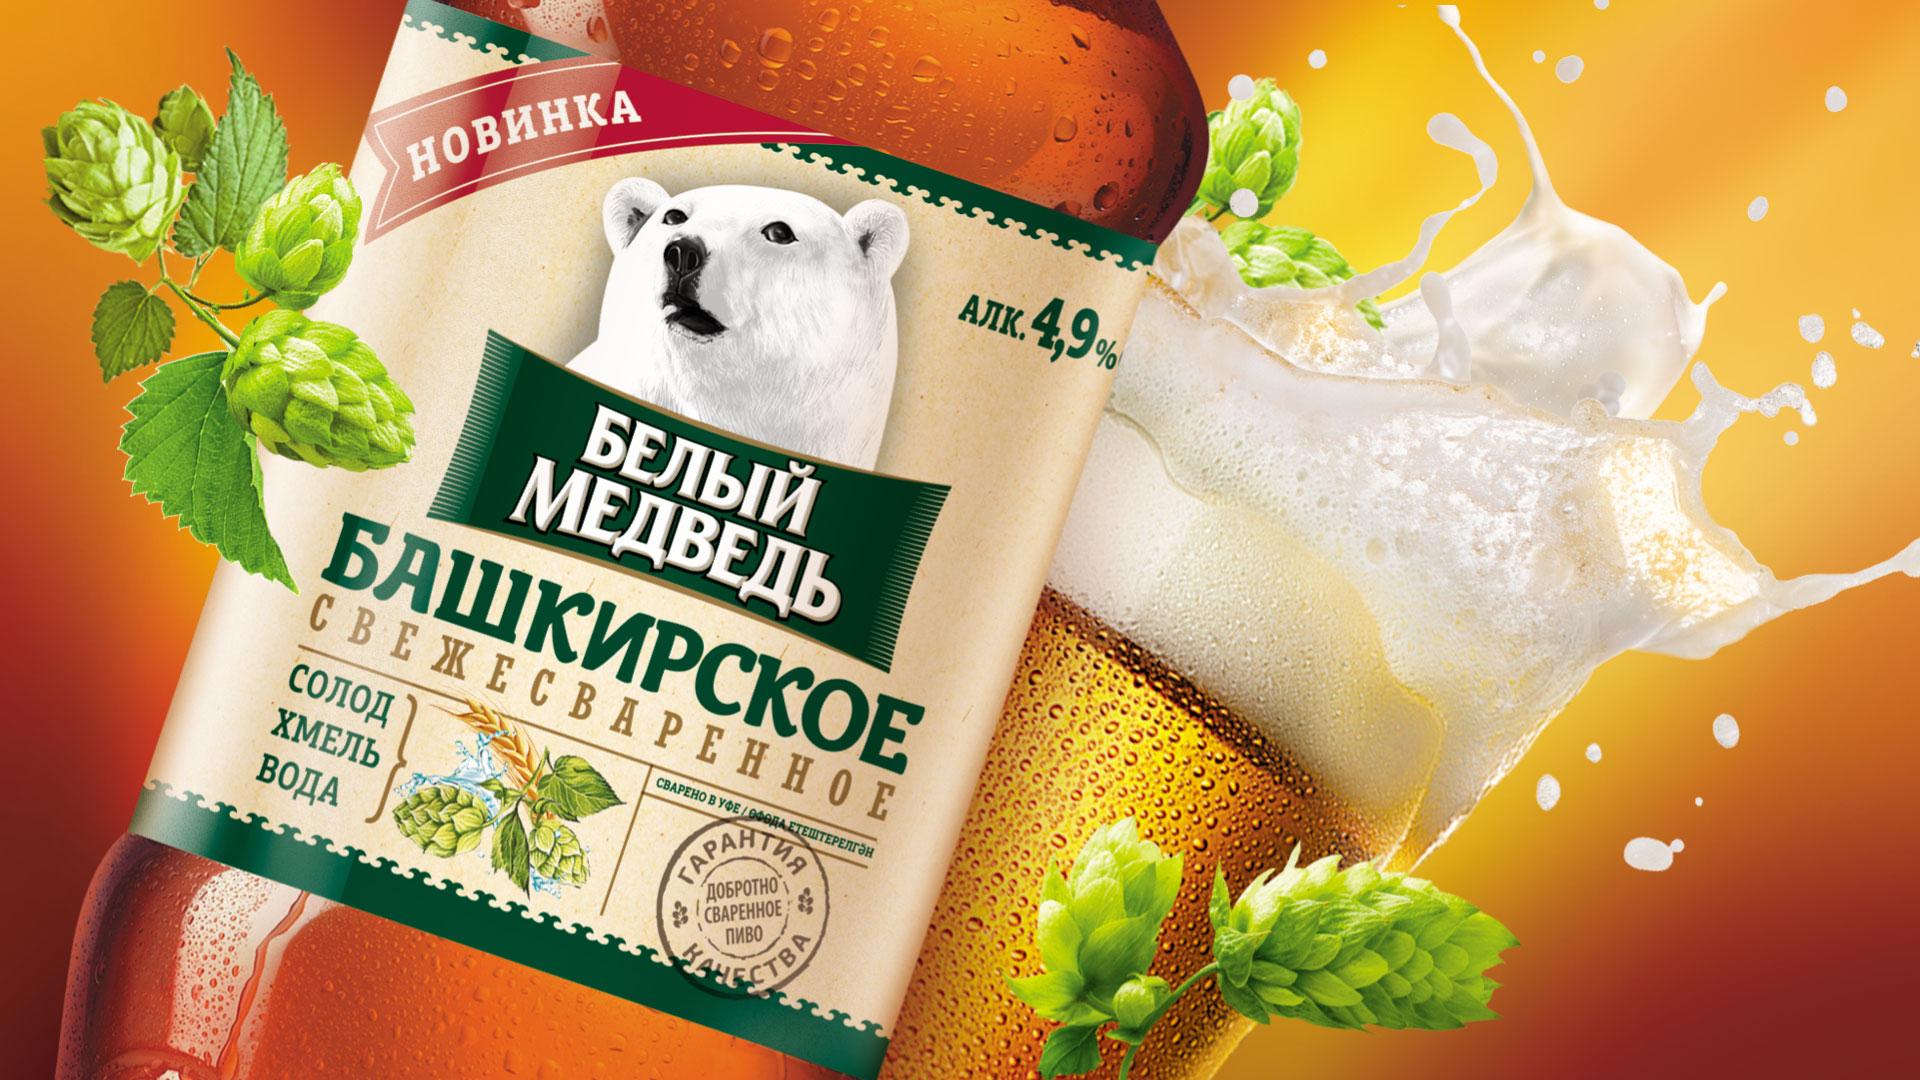 Белый медведь Башкирское